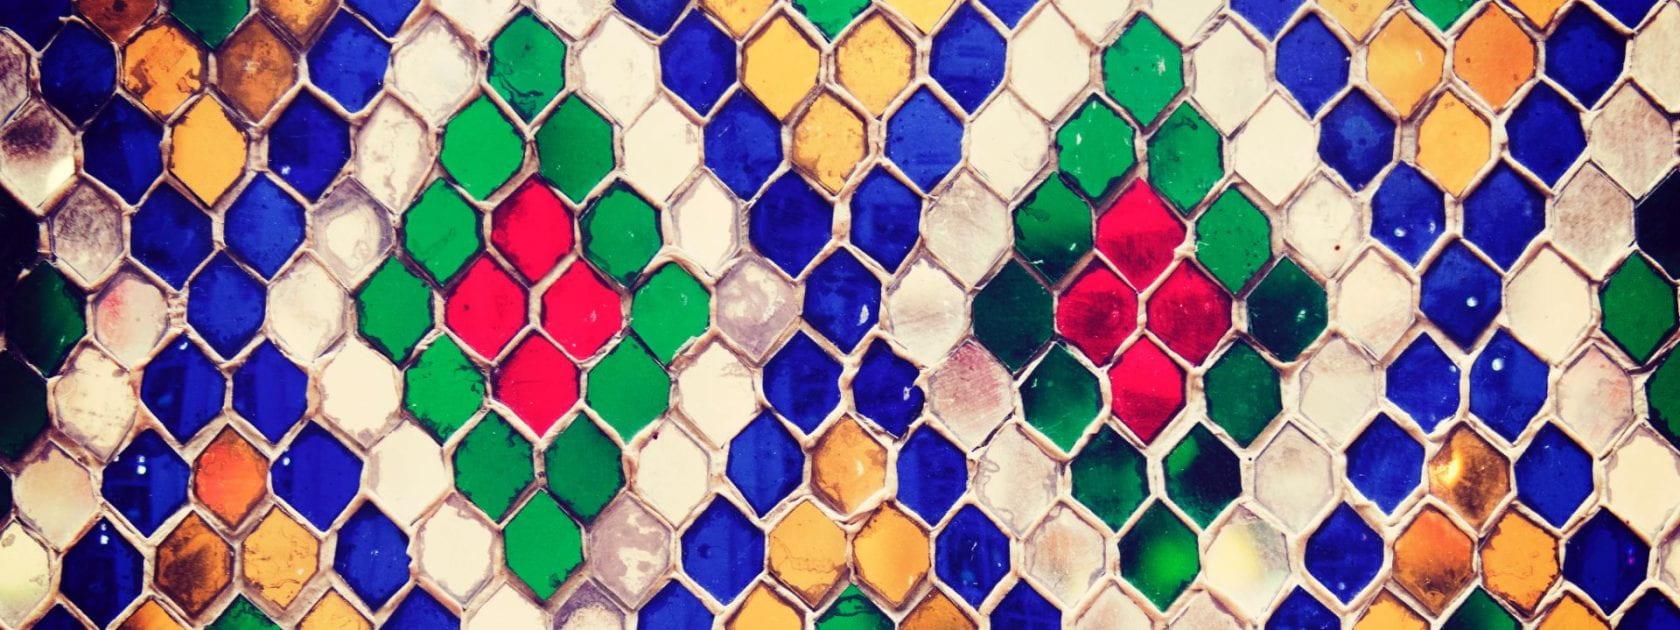 multicolored-mosaic-